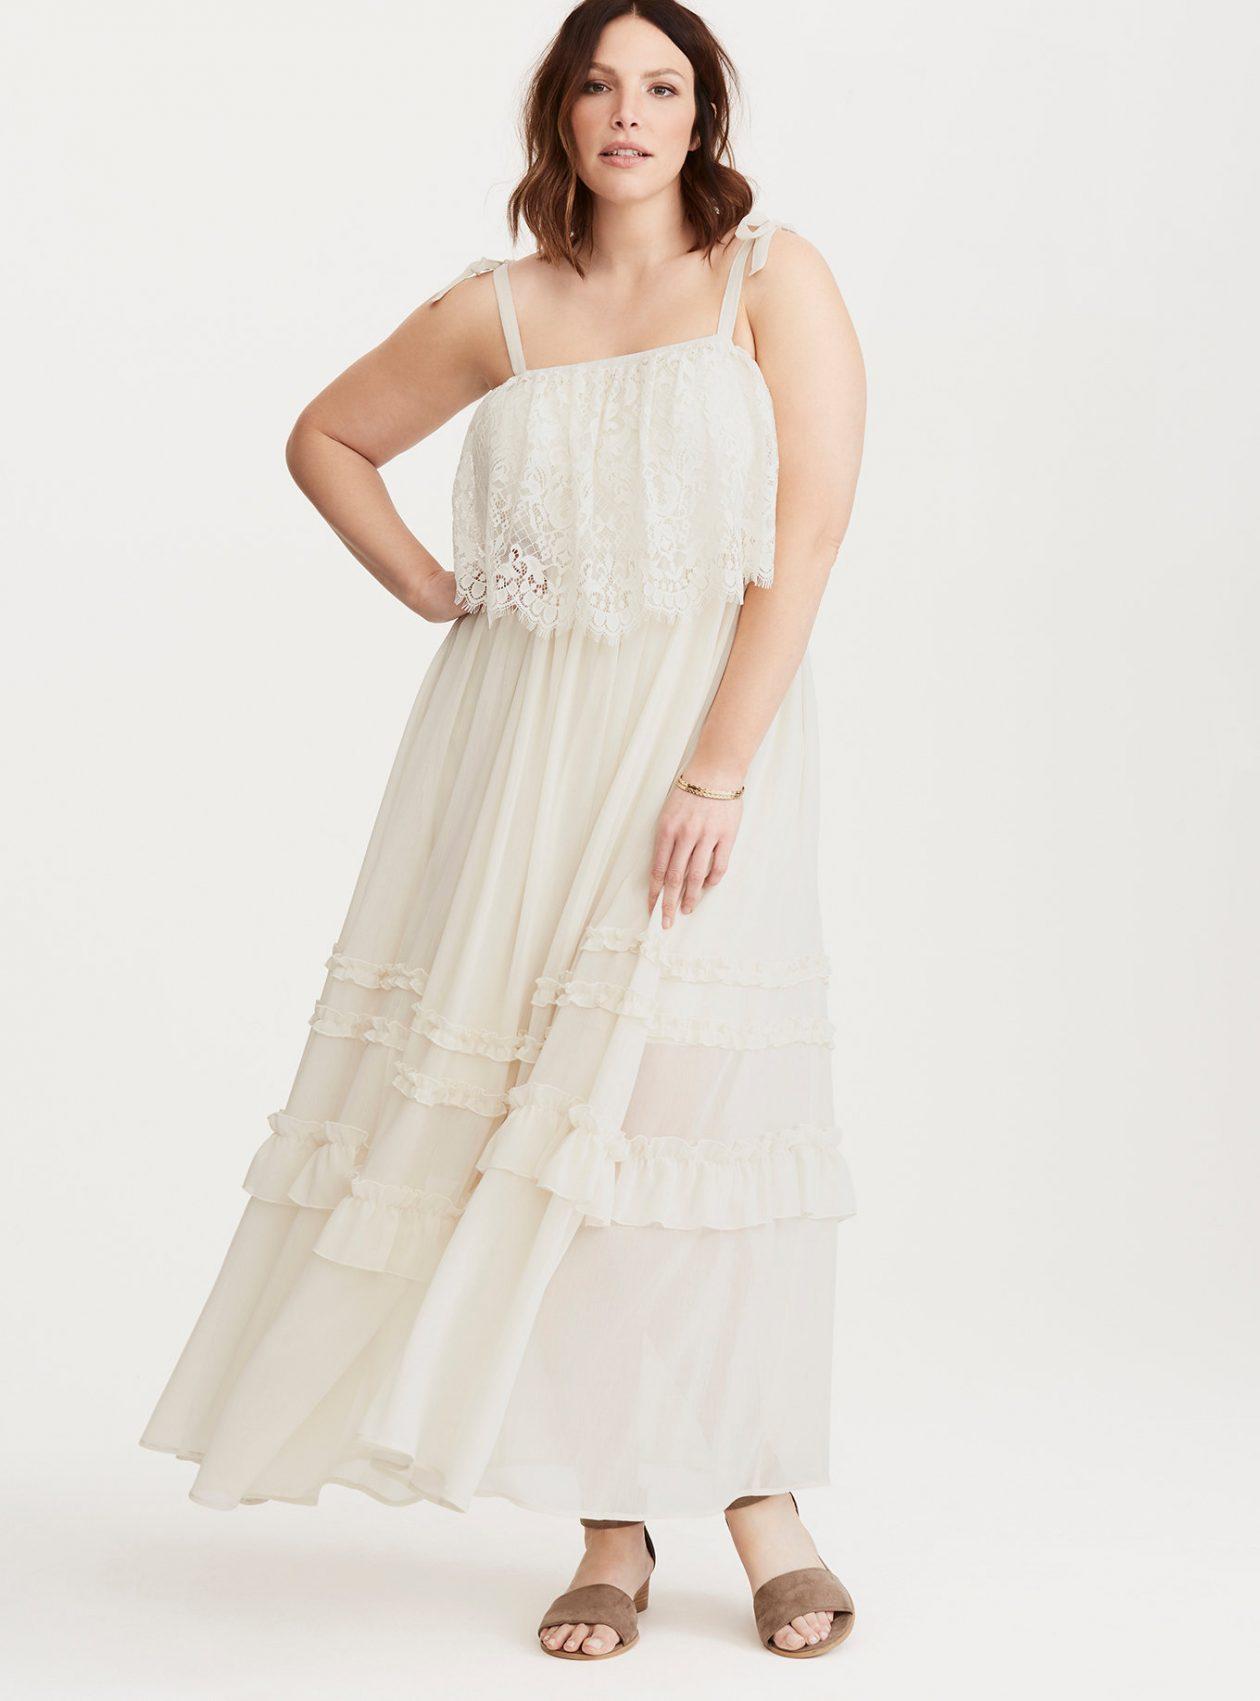 Ruffled Chiffon Lace Maxi Dress at Torrid